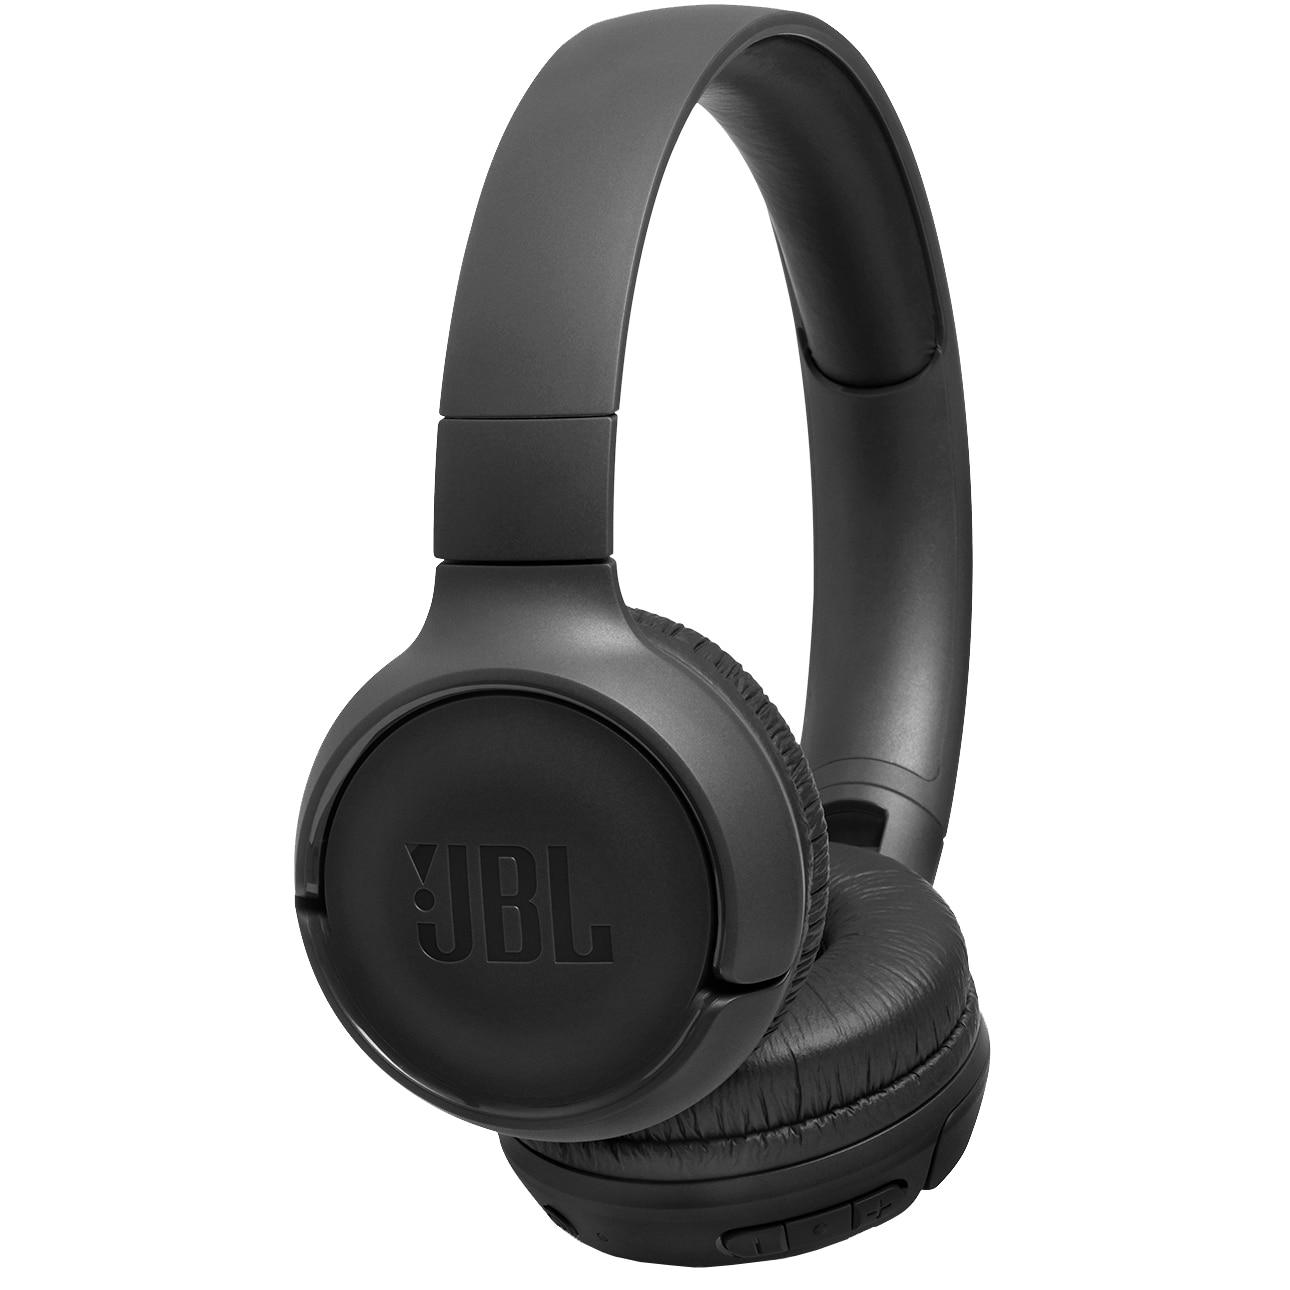 Fotografie Casti audio On-ear JBL Tune 500, Wireless, Bluetooth, Pure Bass Sound, Hands-free Call, 16H, Negru